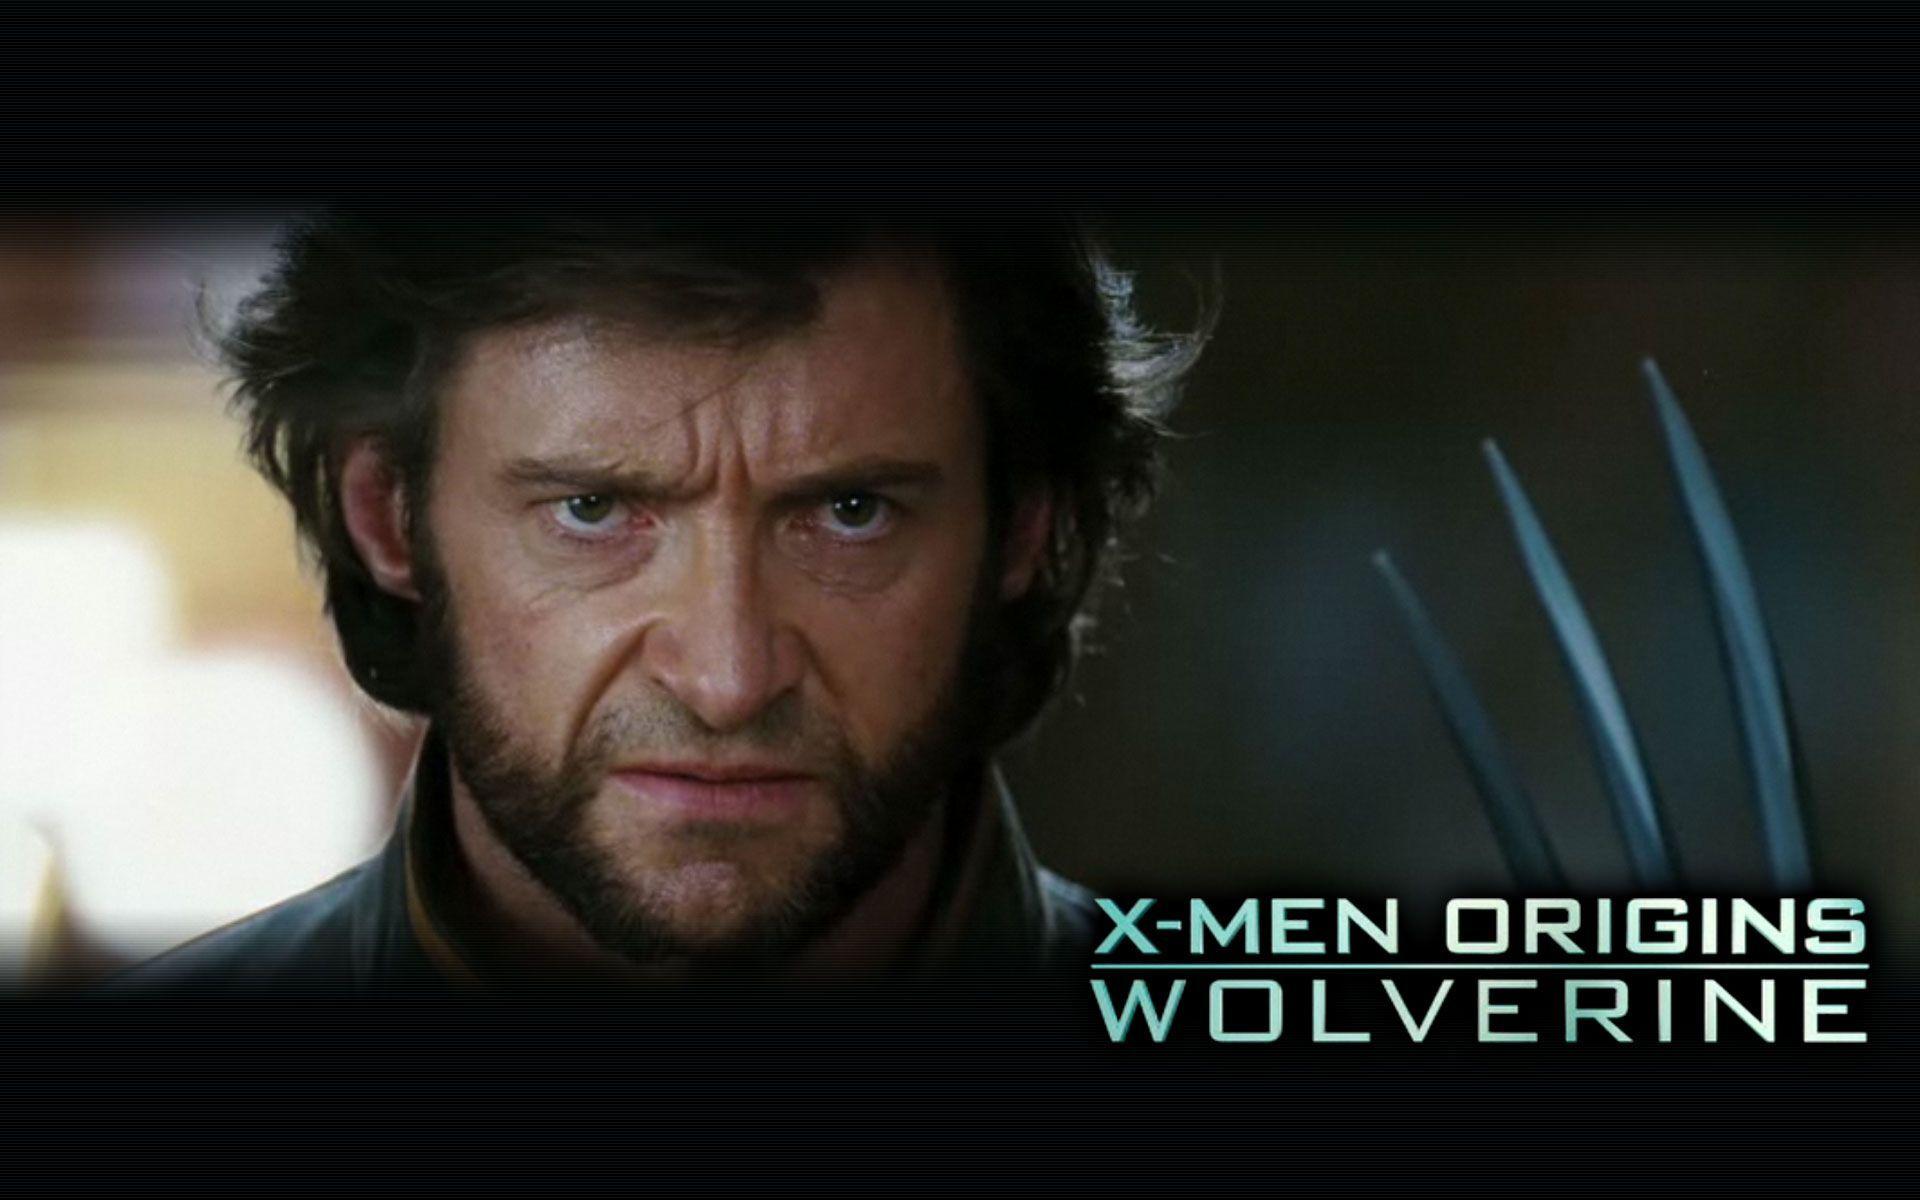 XMen Origins Wolverine Wallpaper With Hugh Jackman Ryan Reynolds